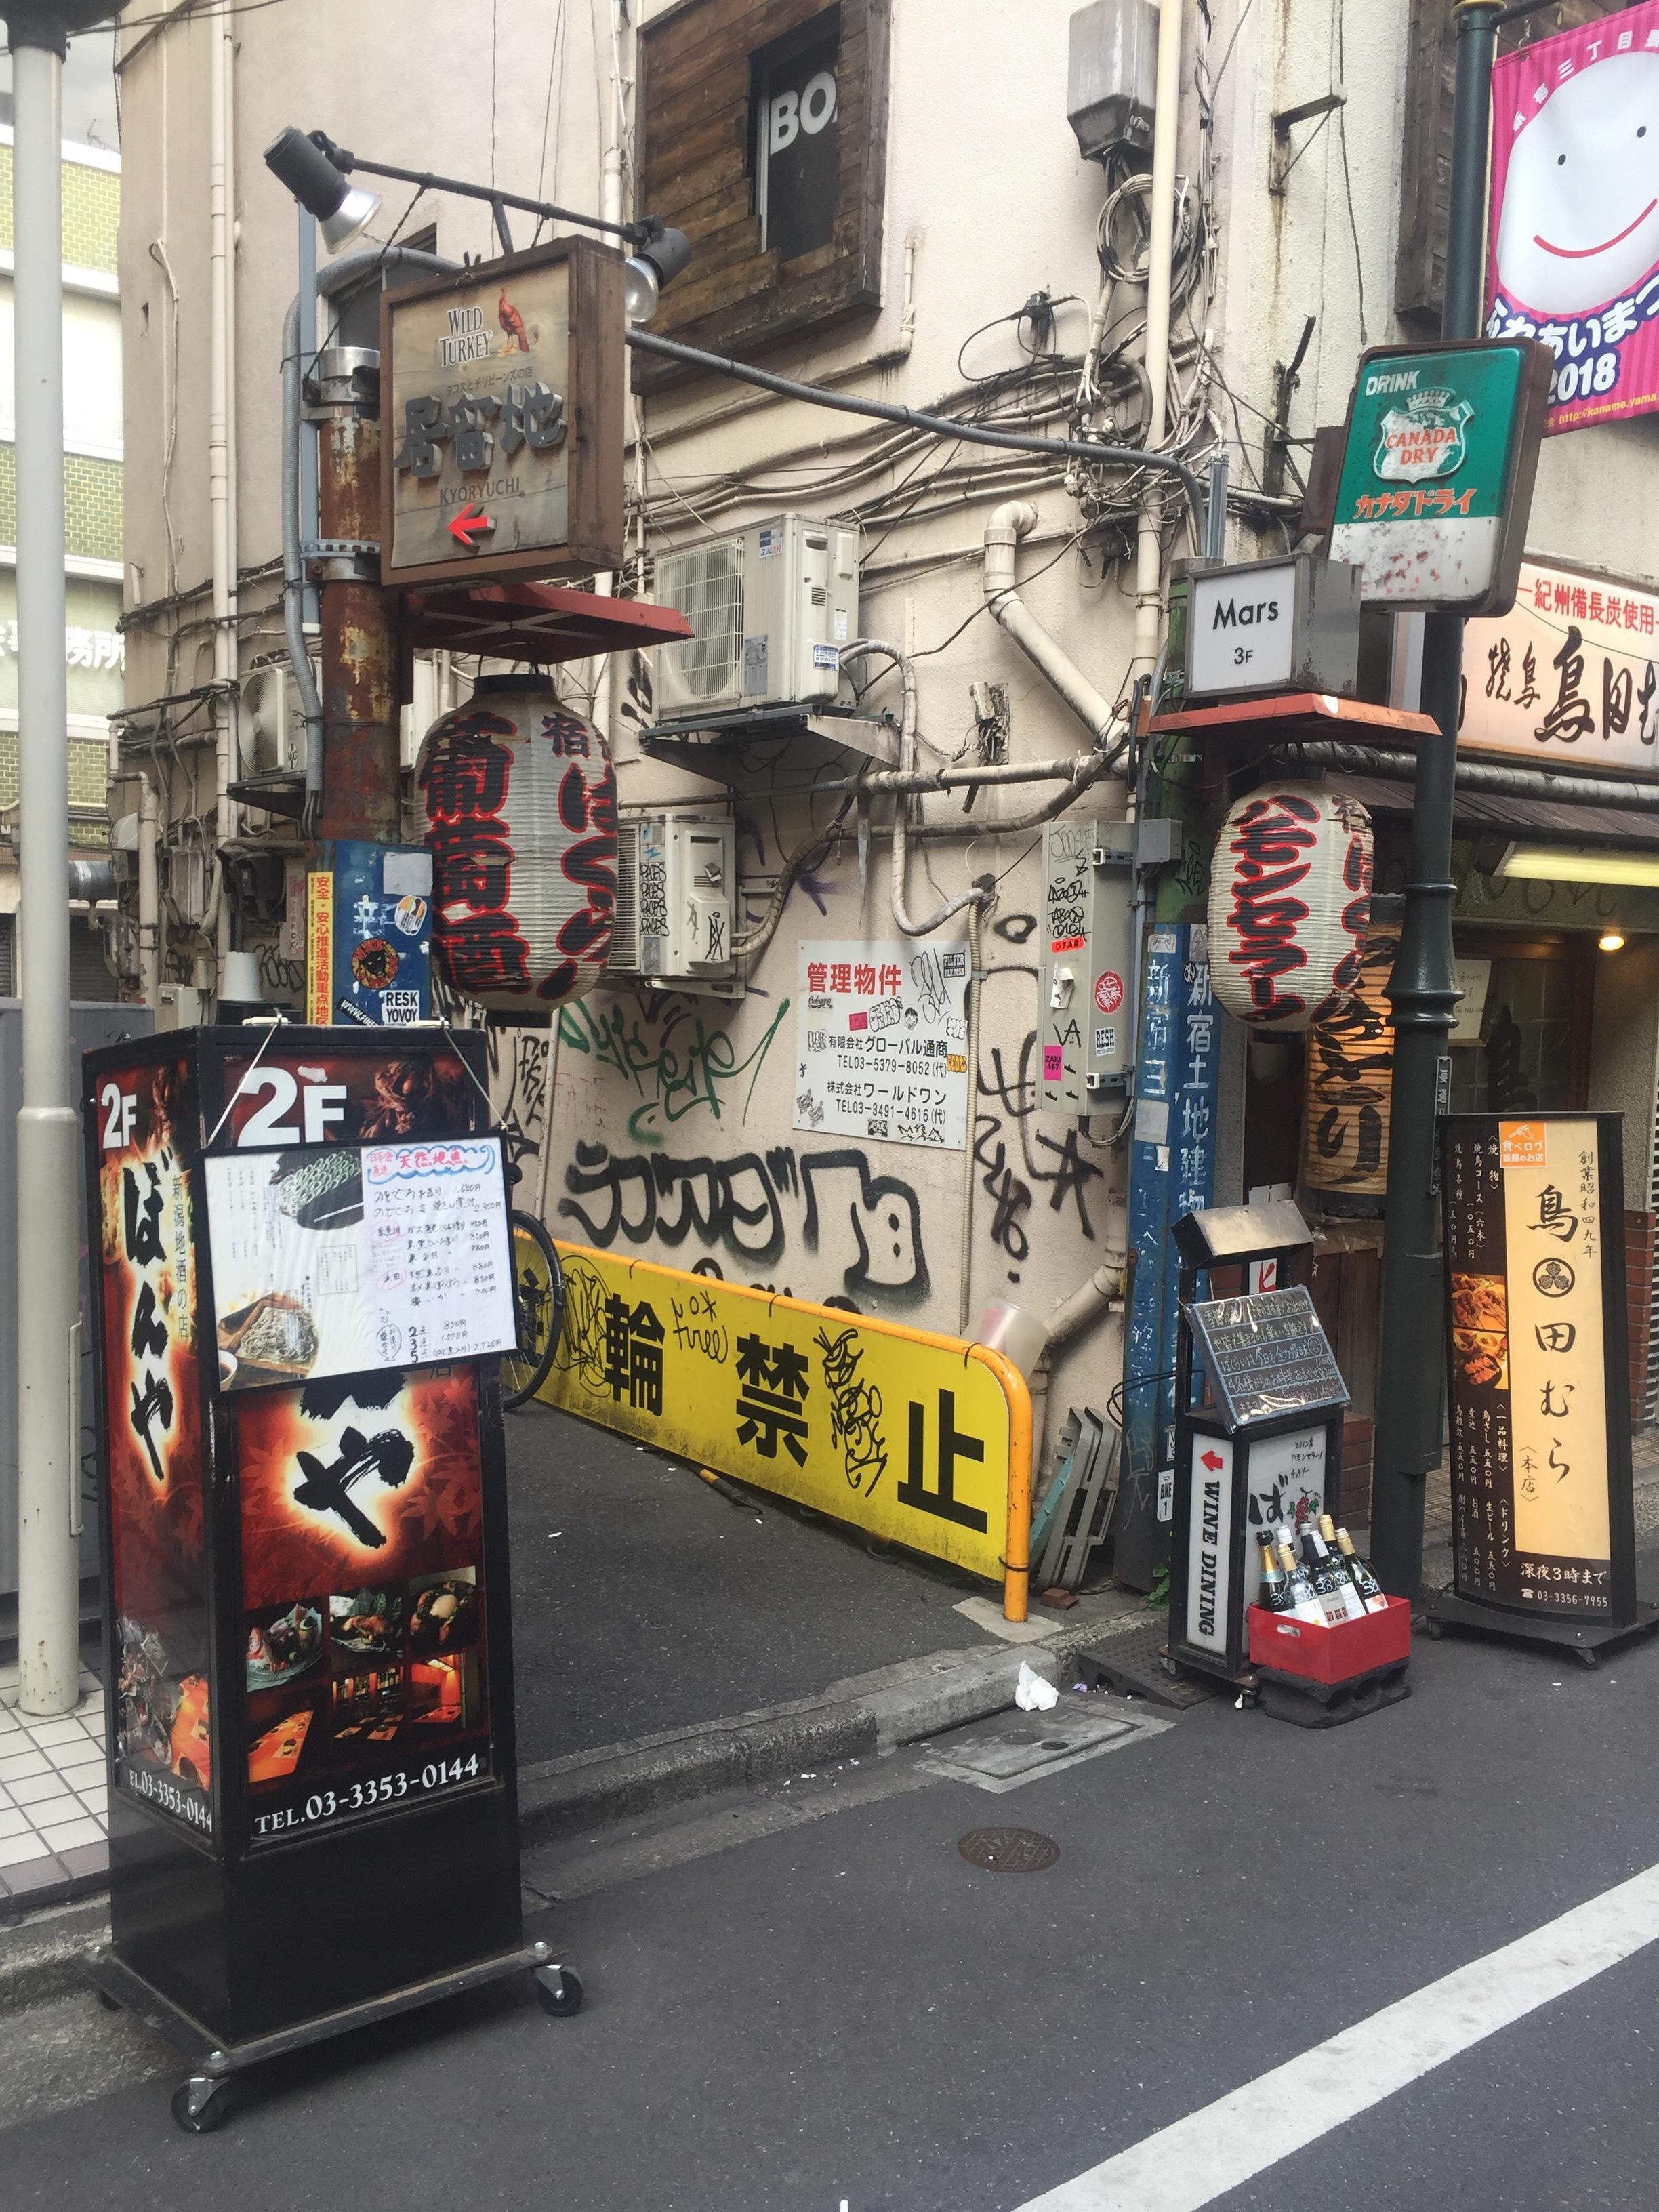 shinjuku graffiti alley tokyo becky jewell.JPG